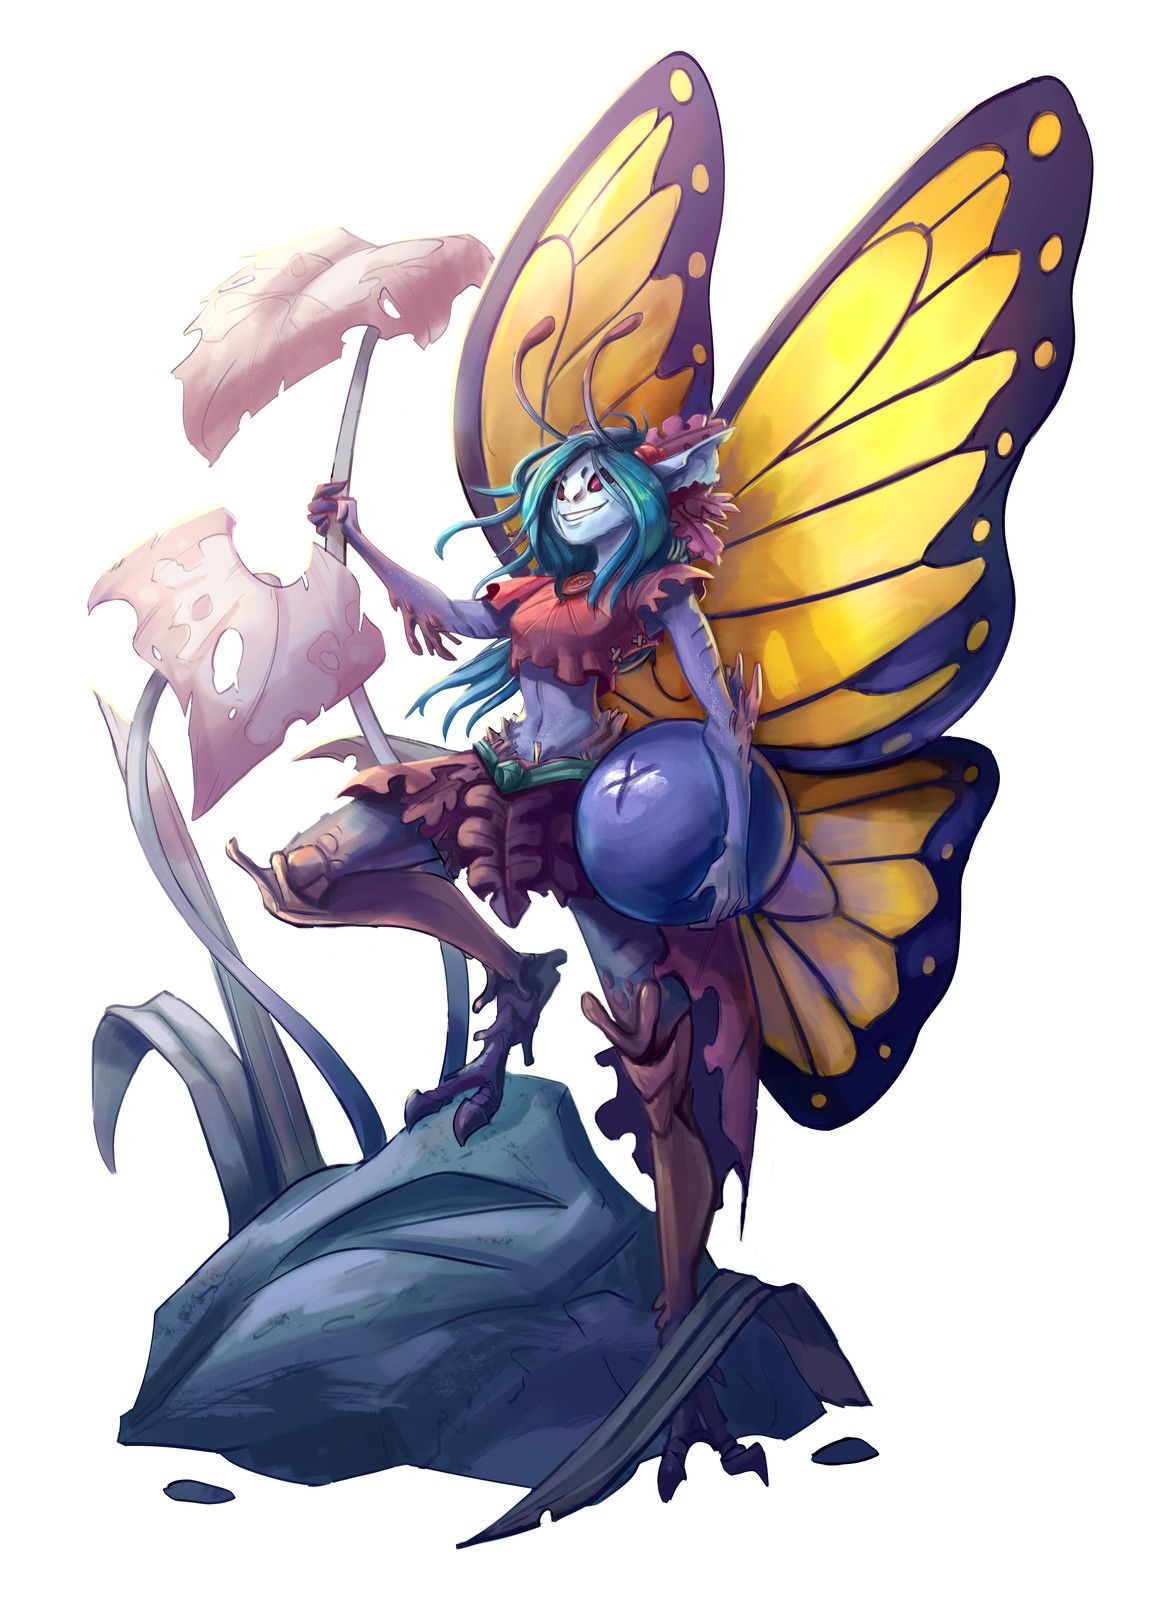 Feywild Fairy, Martin Kirby on ArtStation at https://www.artstation.com/artwork/9o84q